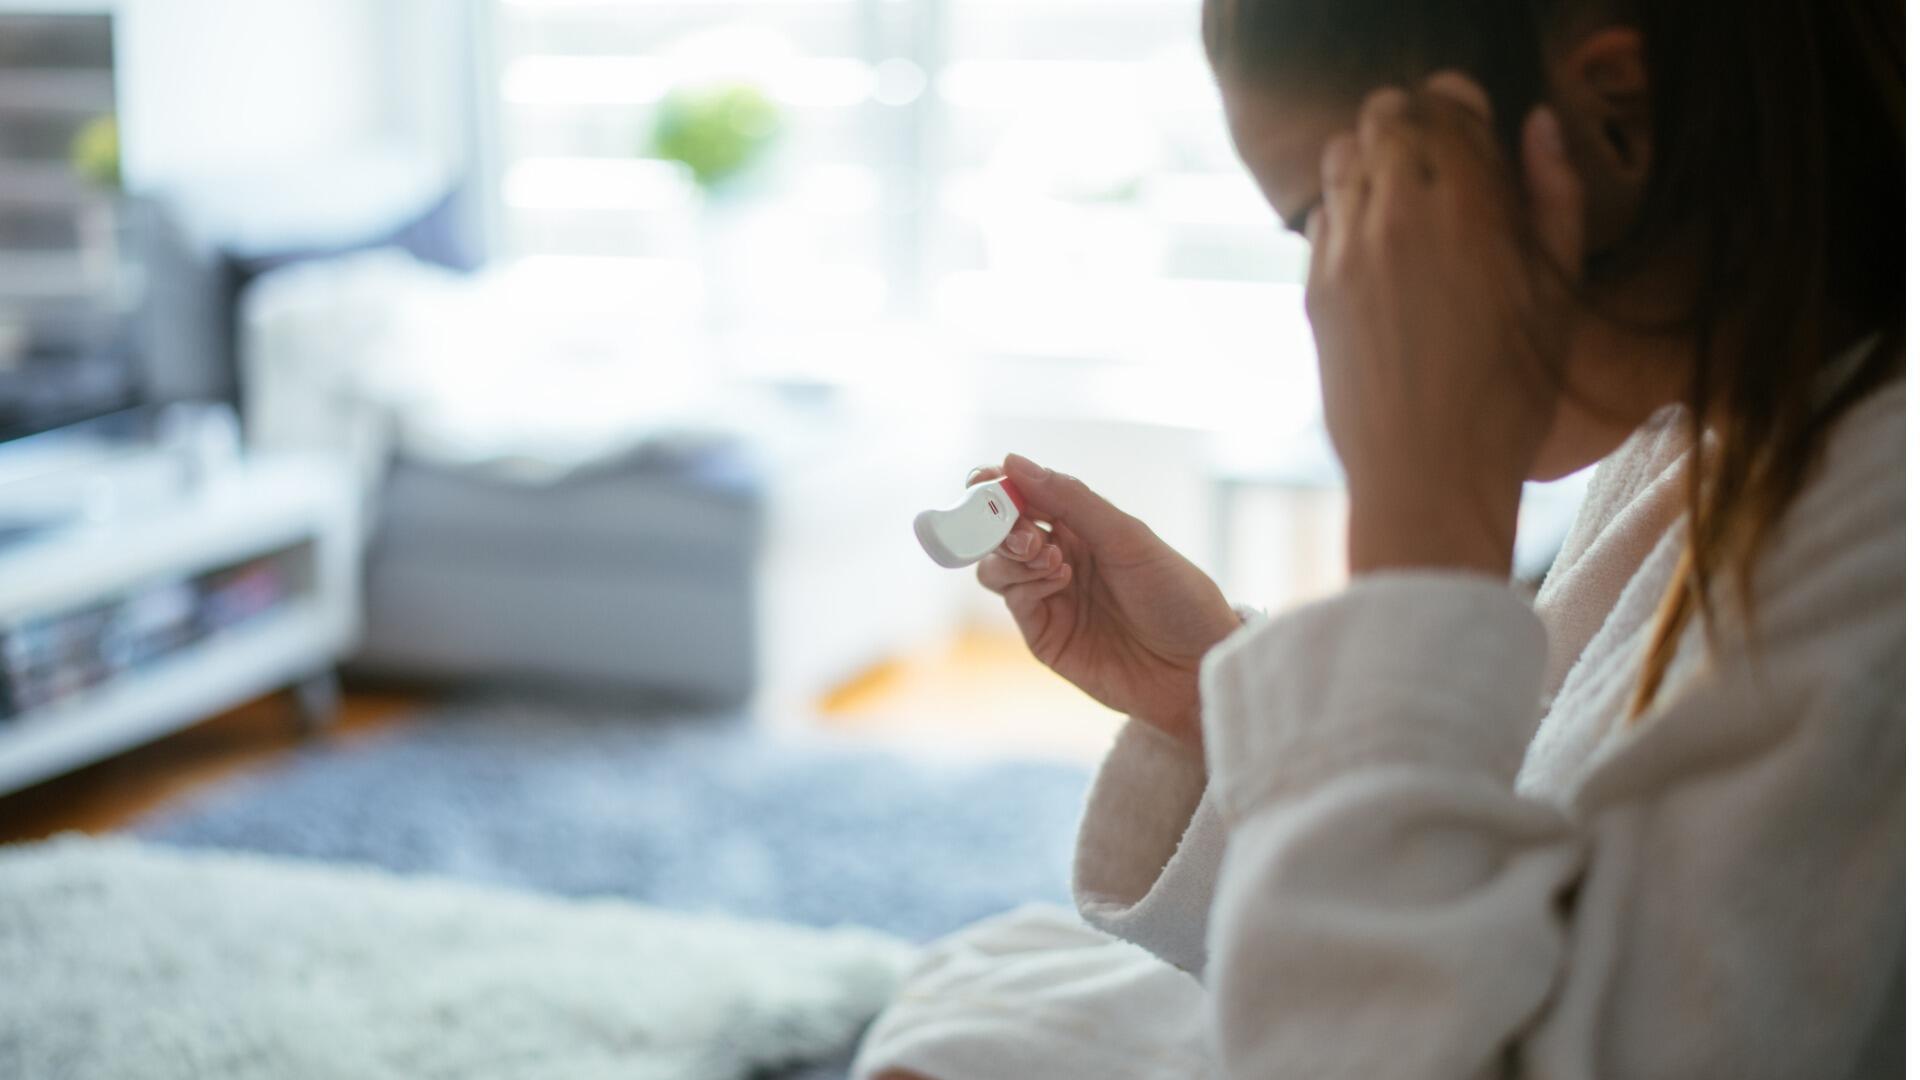 IVG illustration test de grossesse enceinte c milanvirijevic